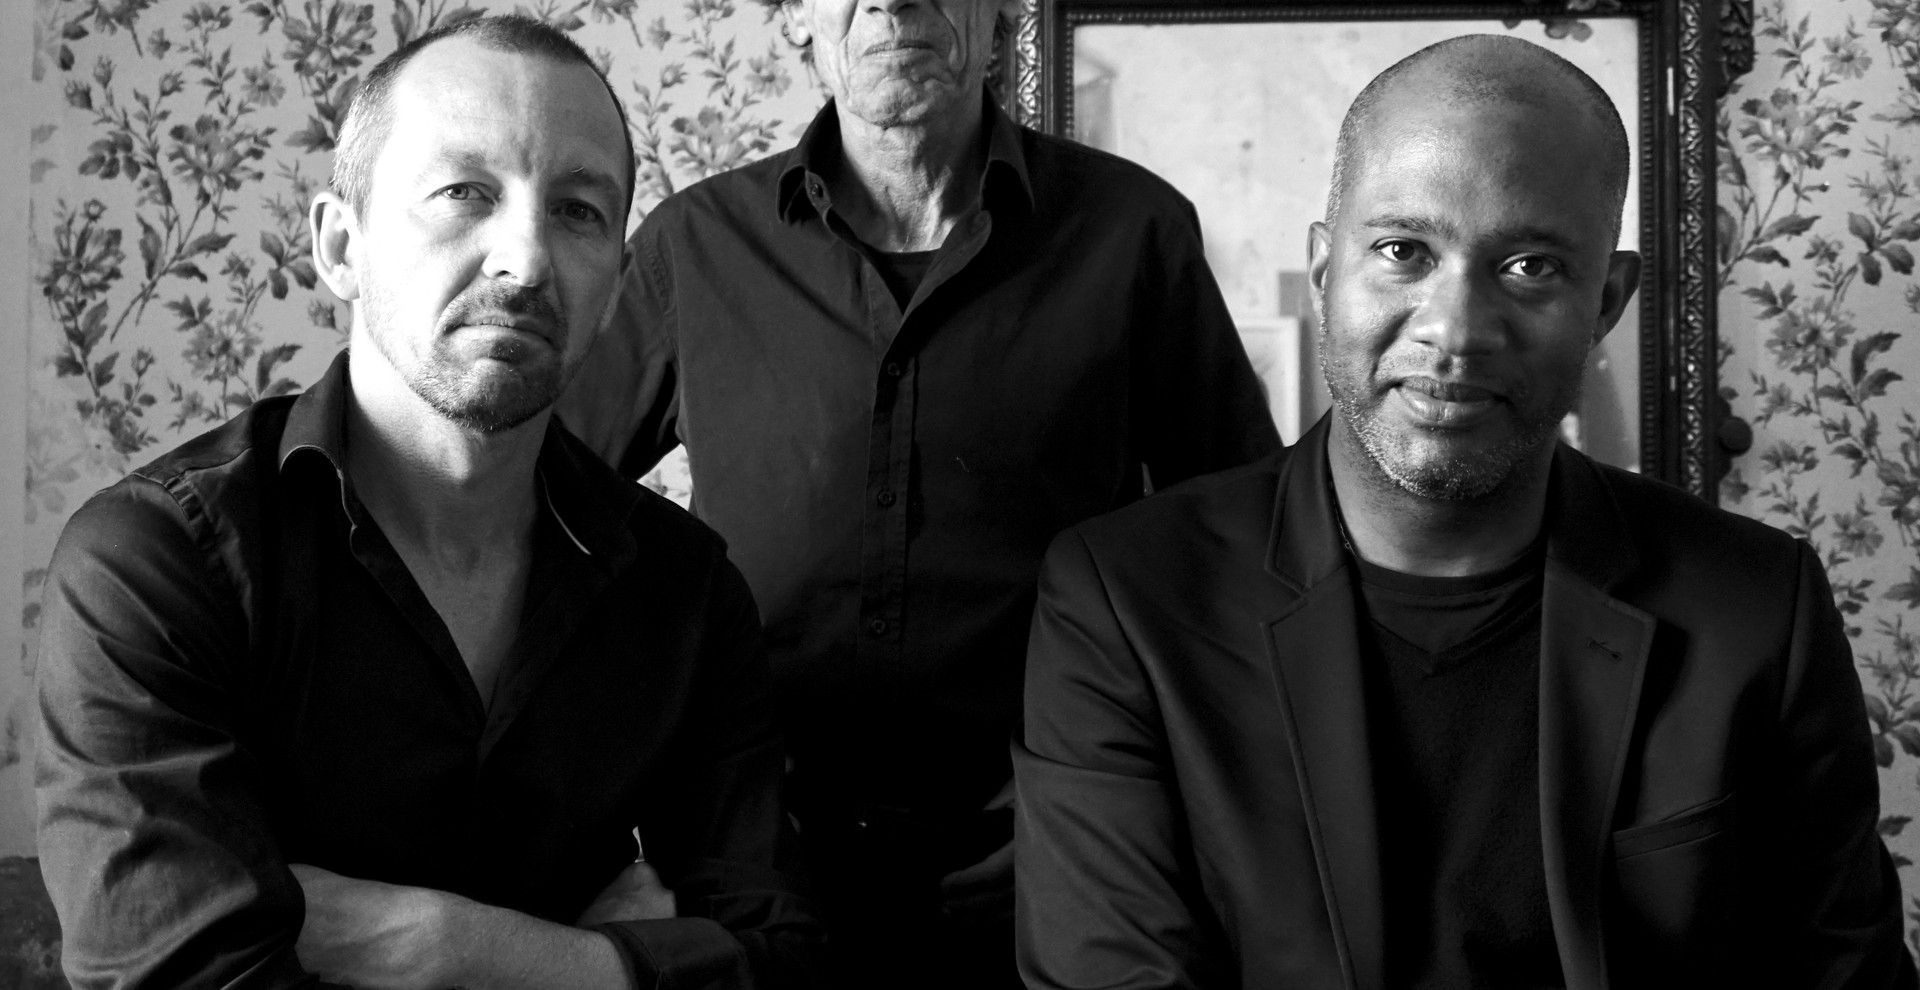 Shakespeare trio // 19 juillet